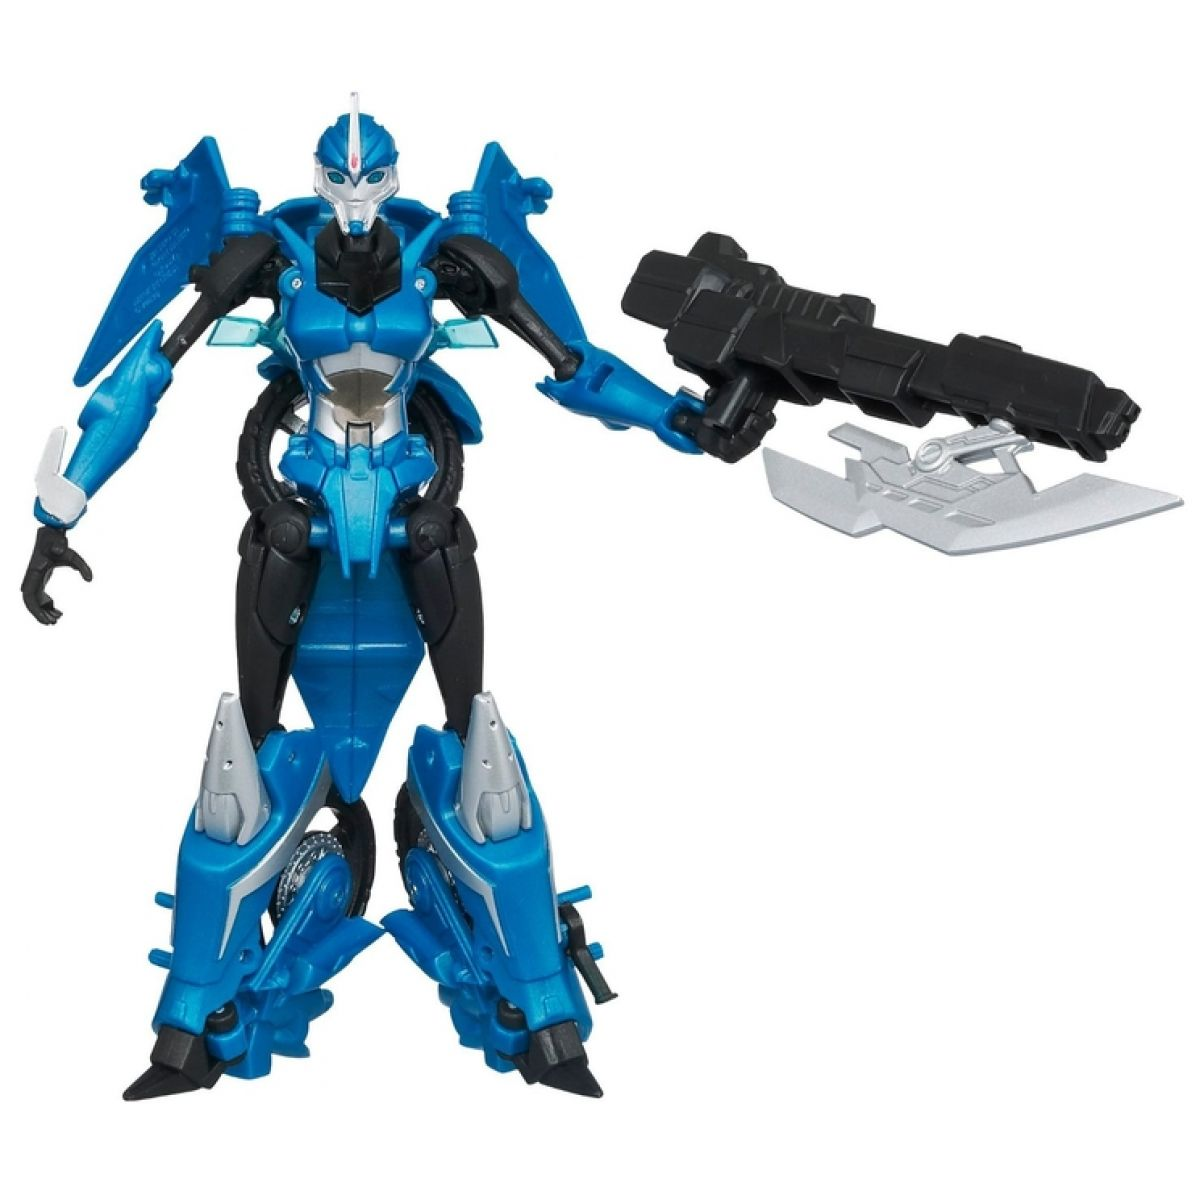 Transformers Robots in Disguise Hasbro - Arcee